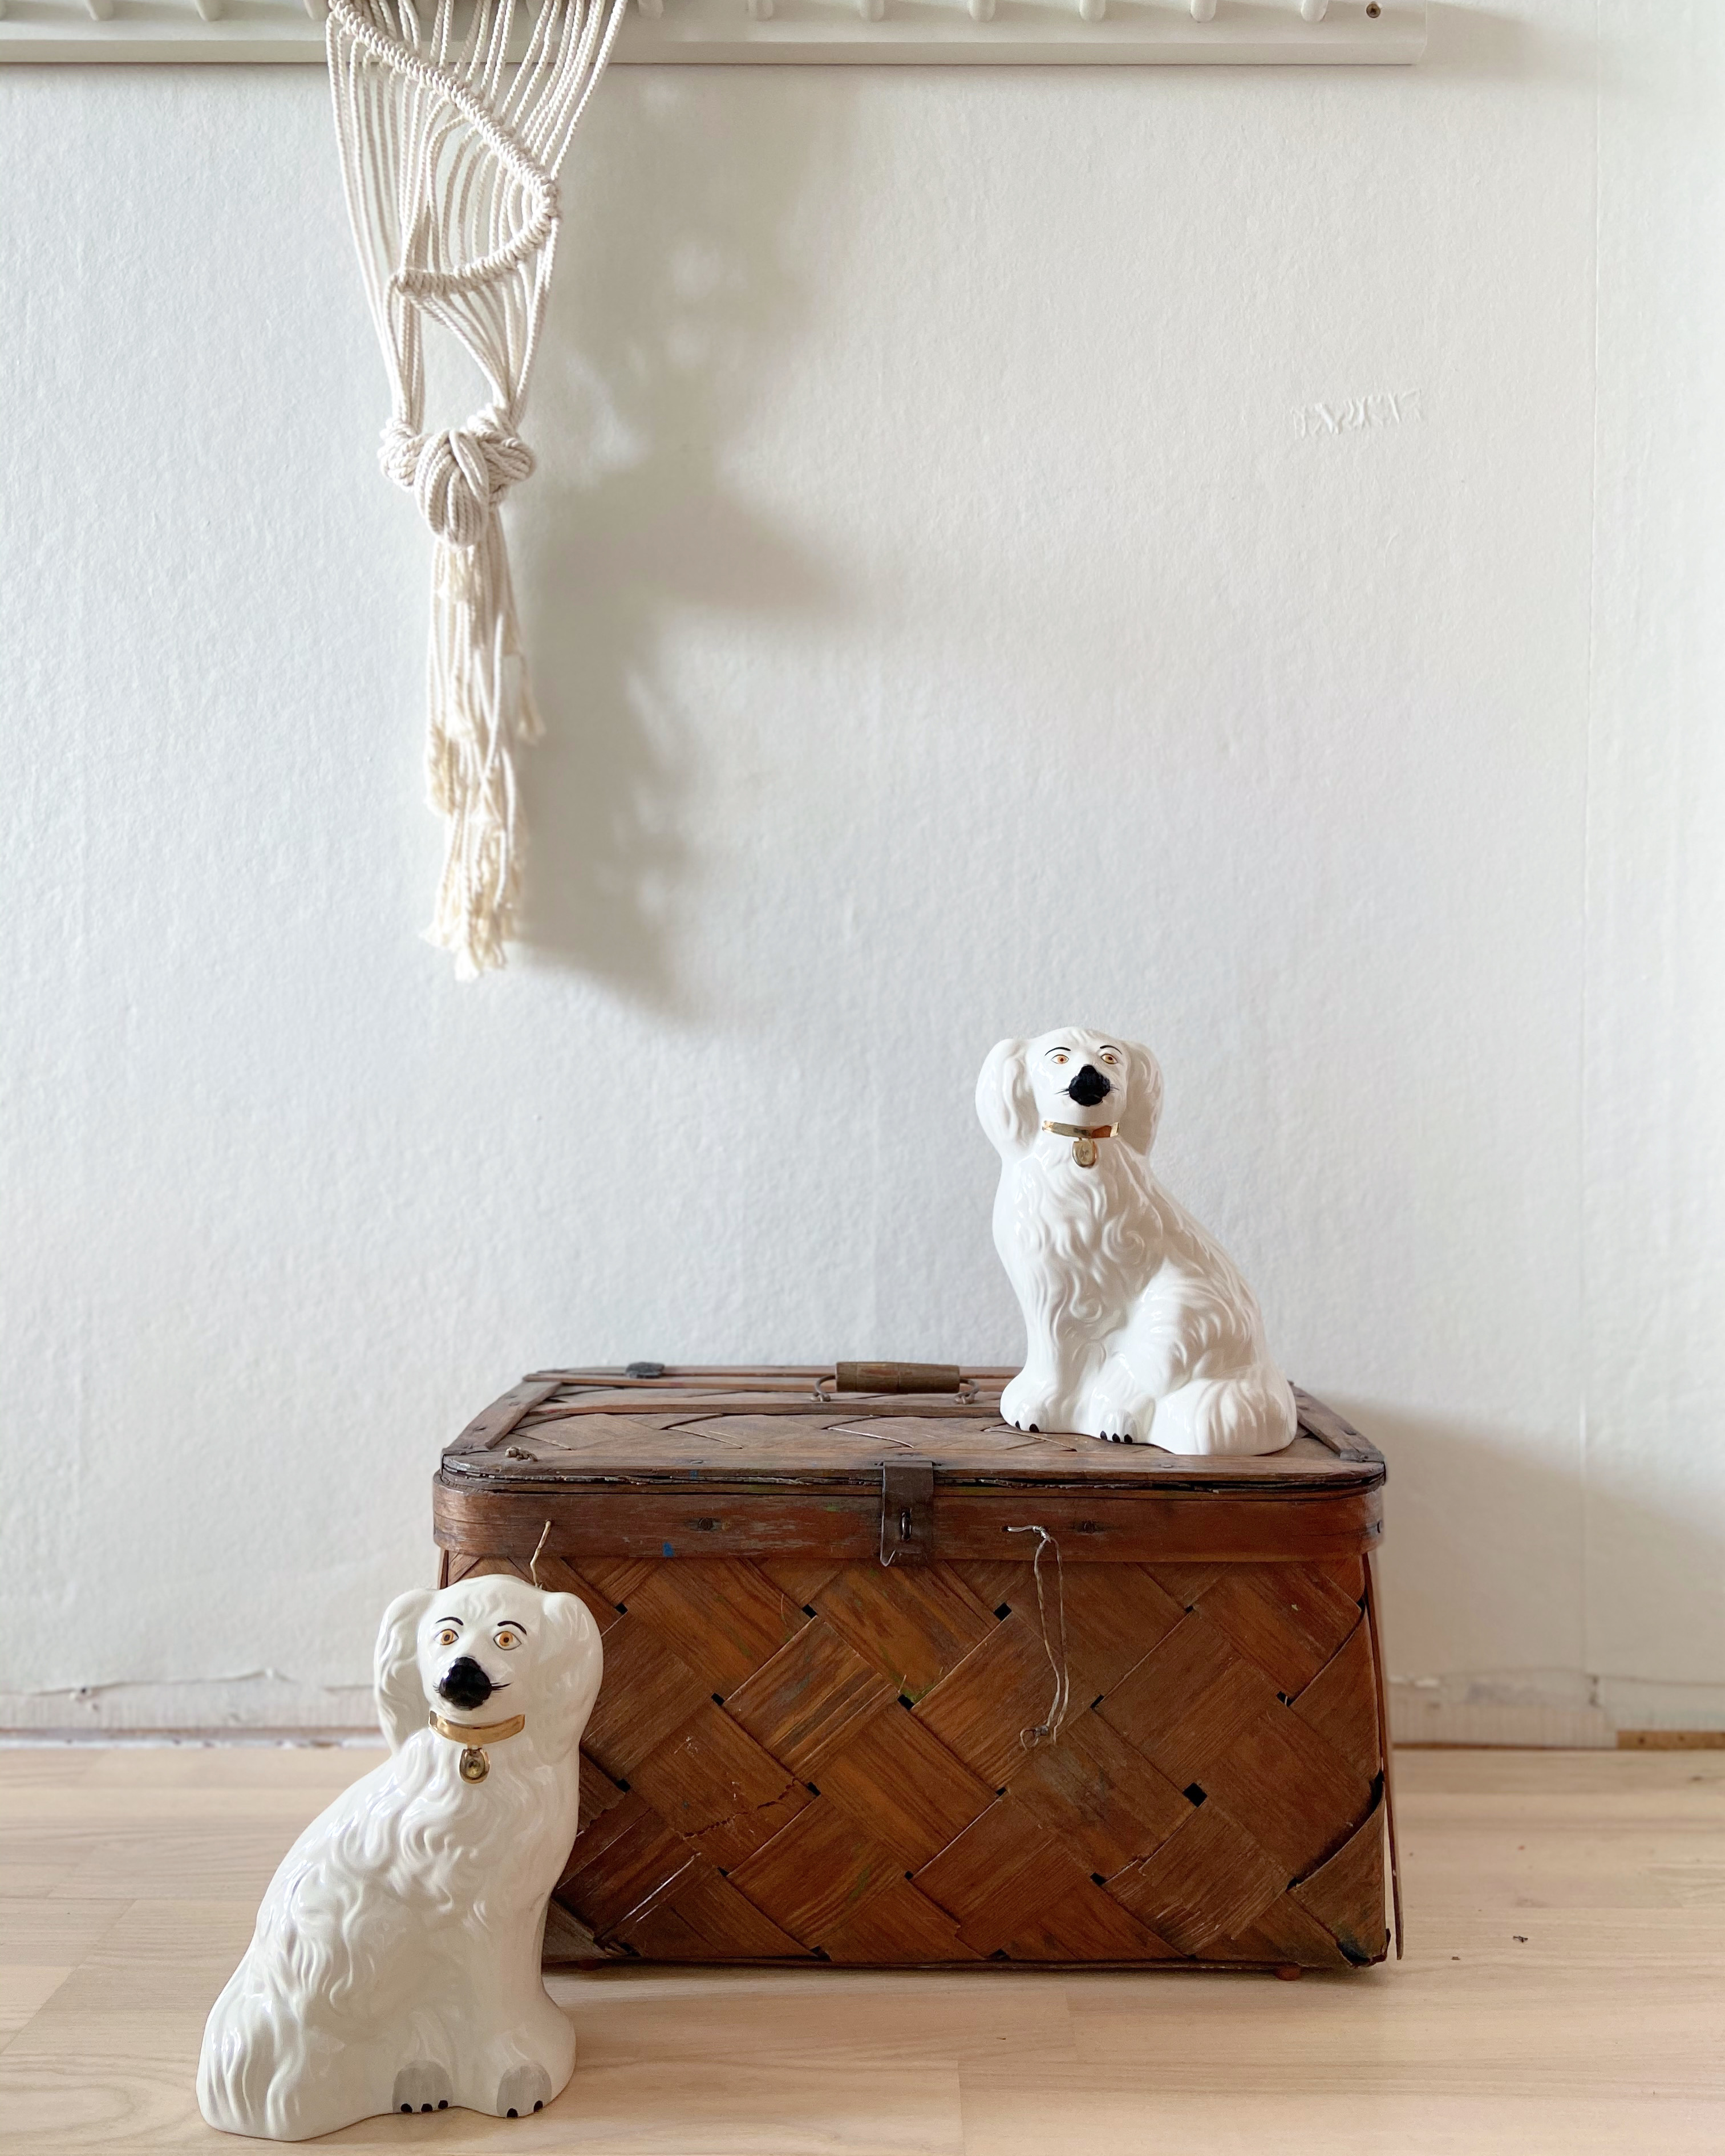 Porslinshundar, Beswick